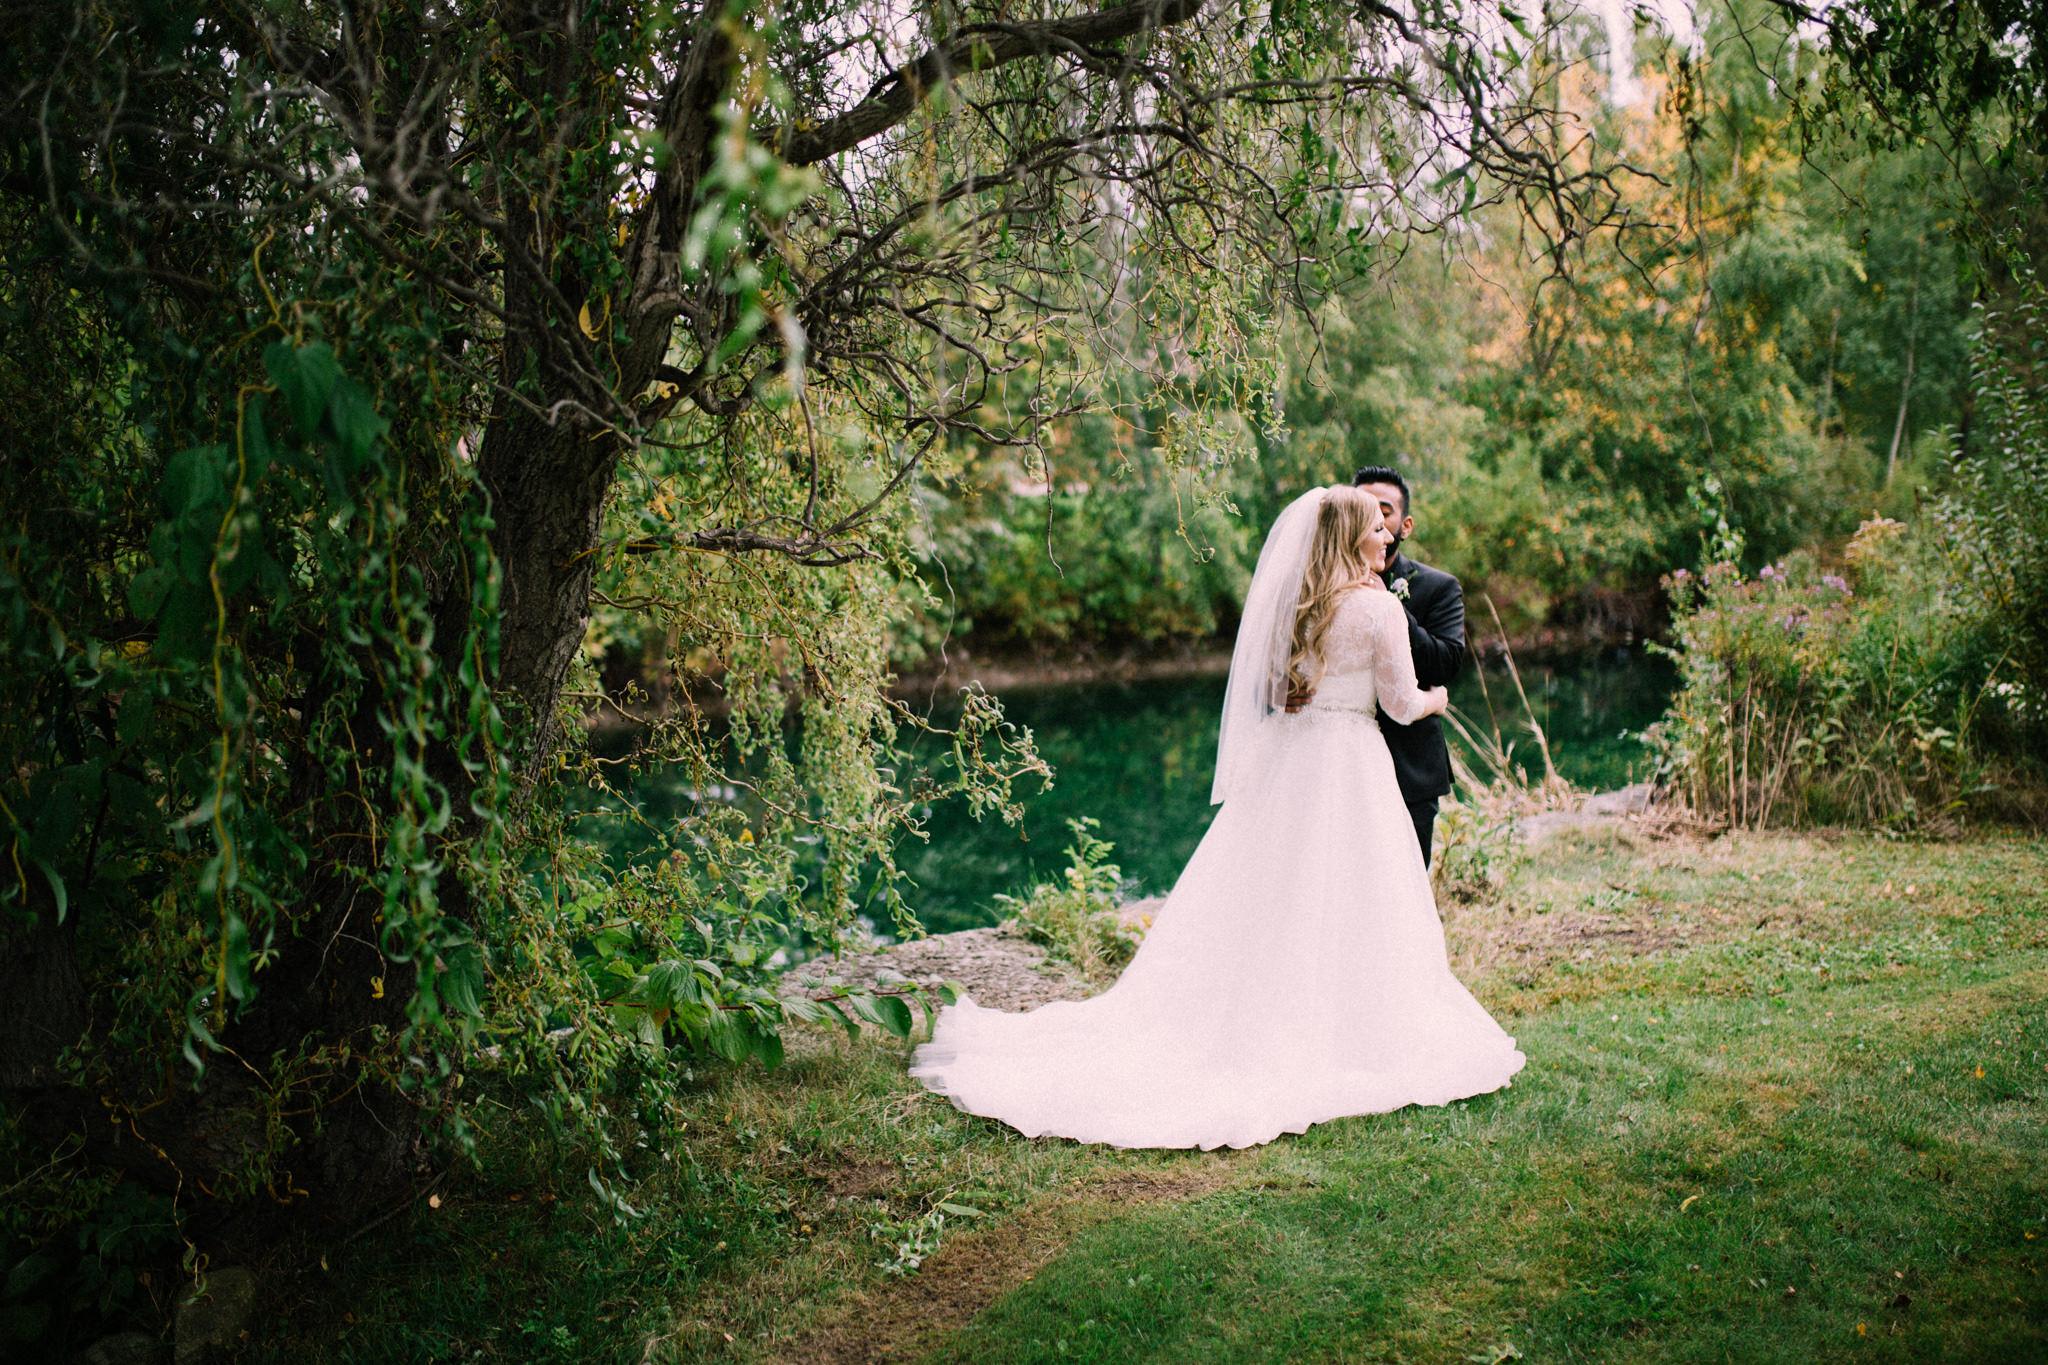 Backyard wedding in Brechin by Max Wong Photo (32)